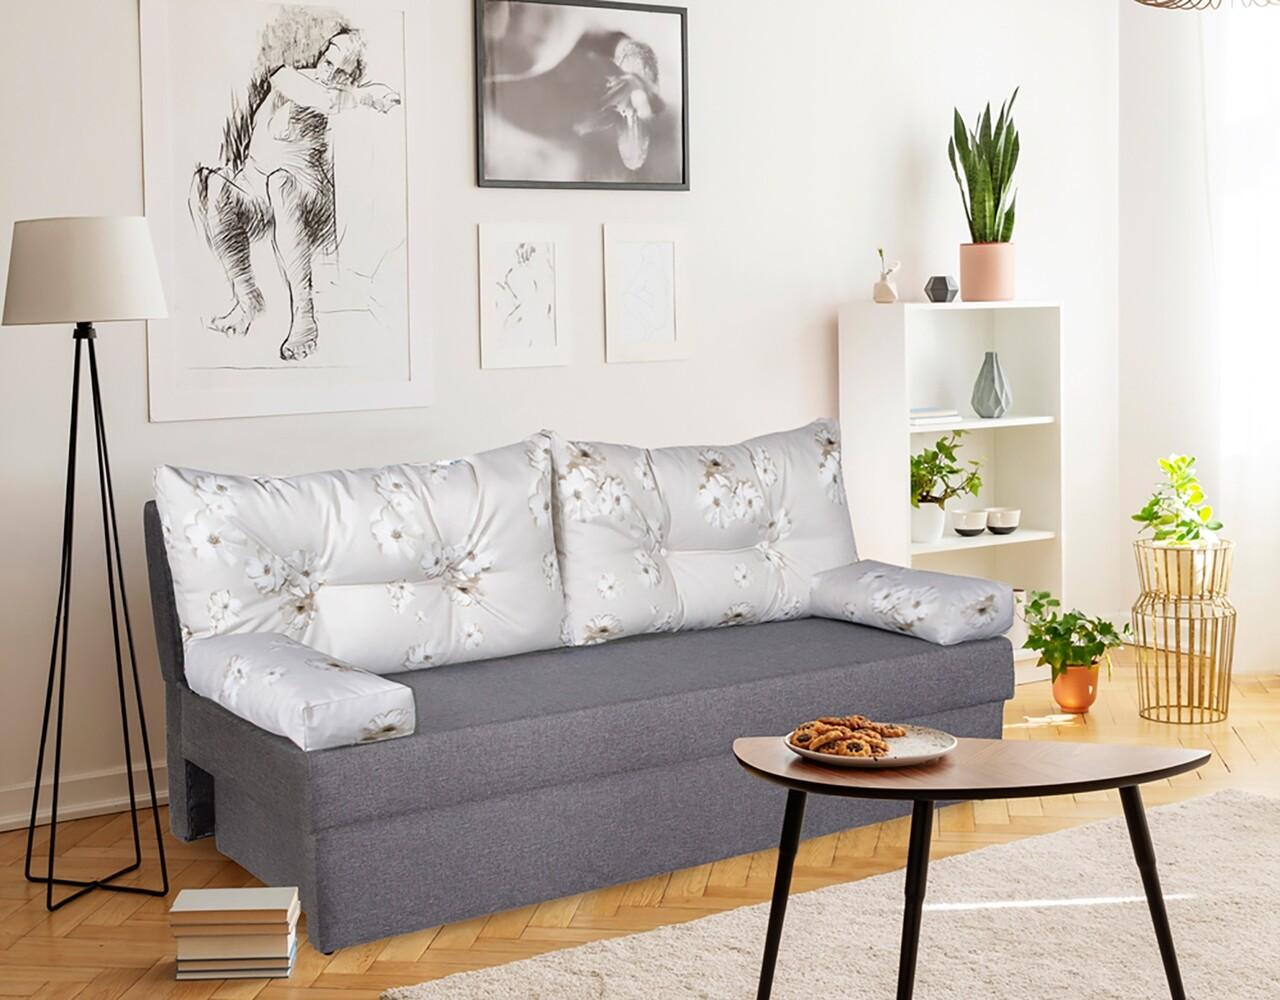 Canapea extensibila Alfi Grey Daisies Flower 192 x 80 x 77 cm + lada de depozitare